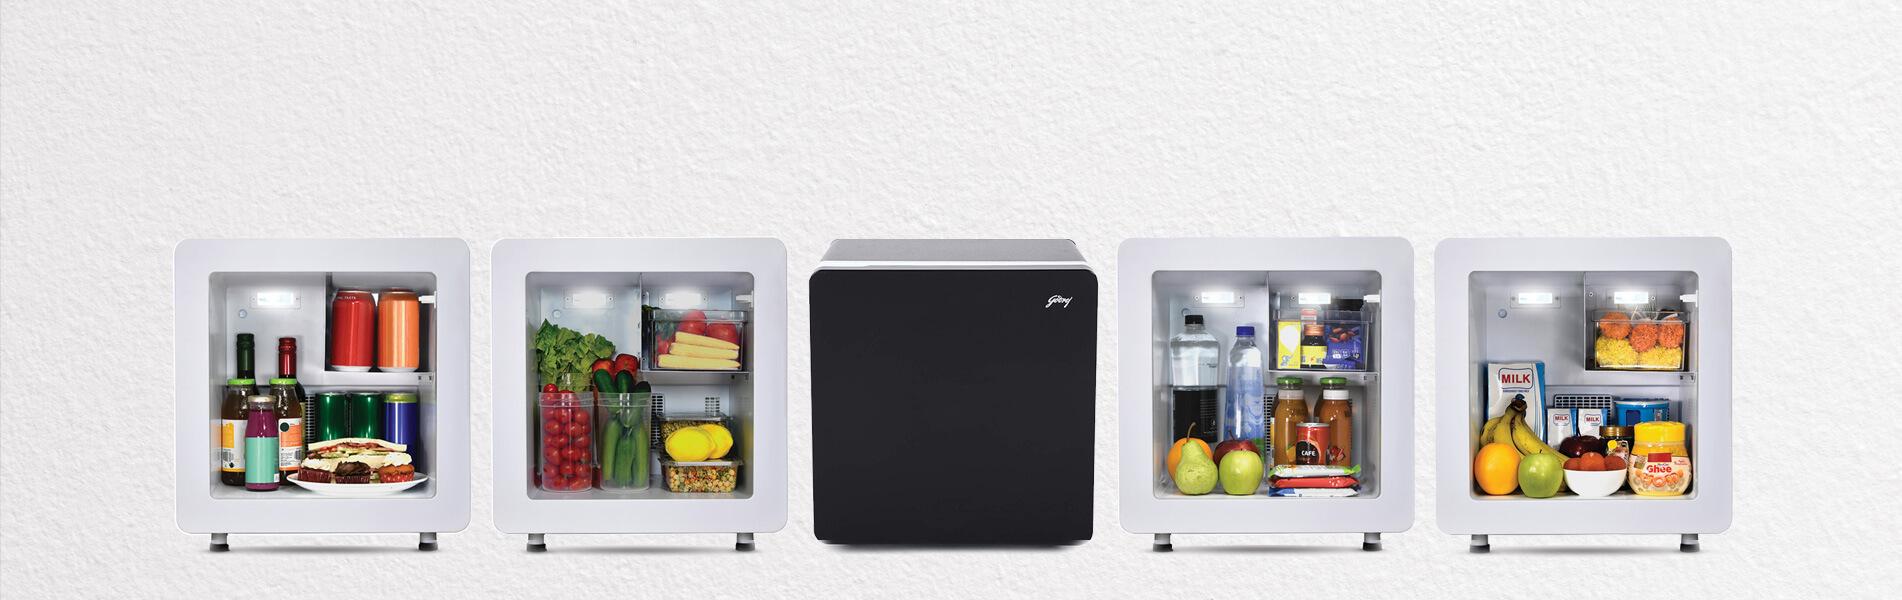 Personal-Food-Beverage-Cooler